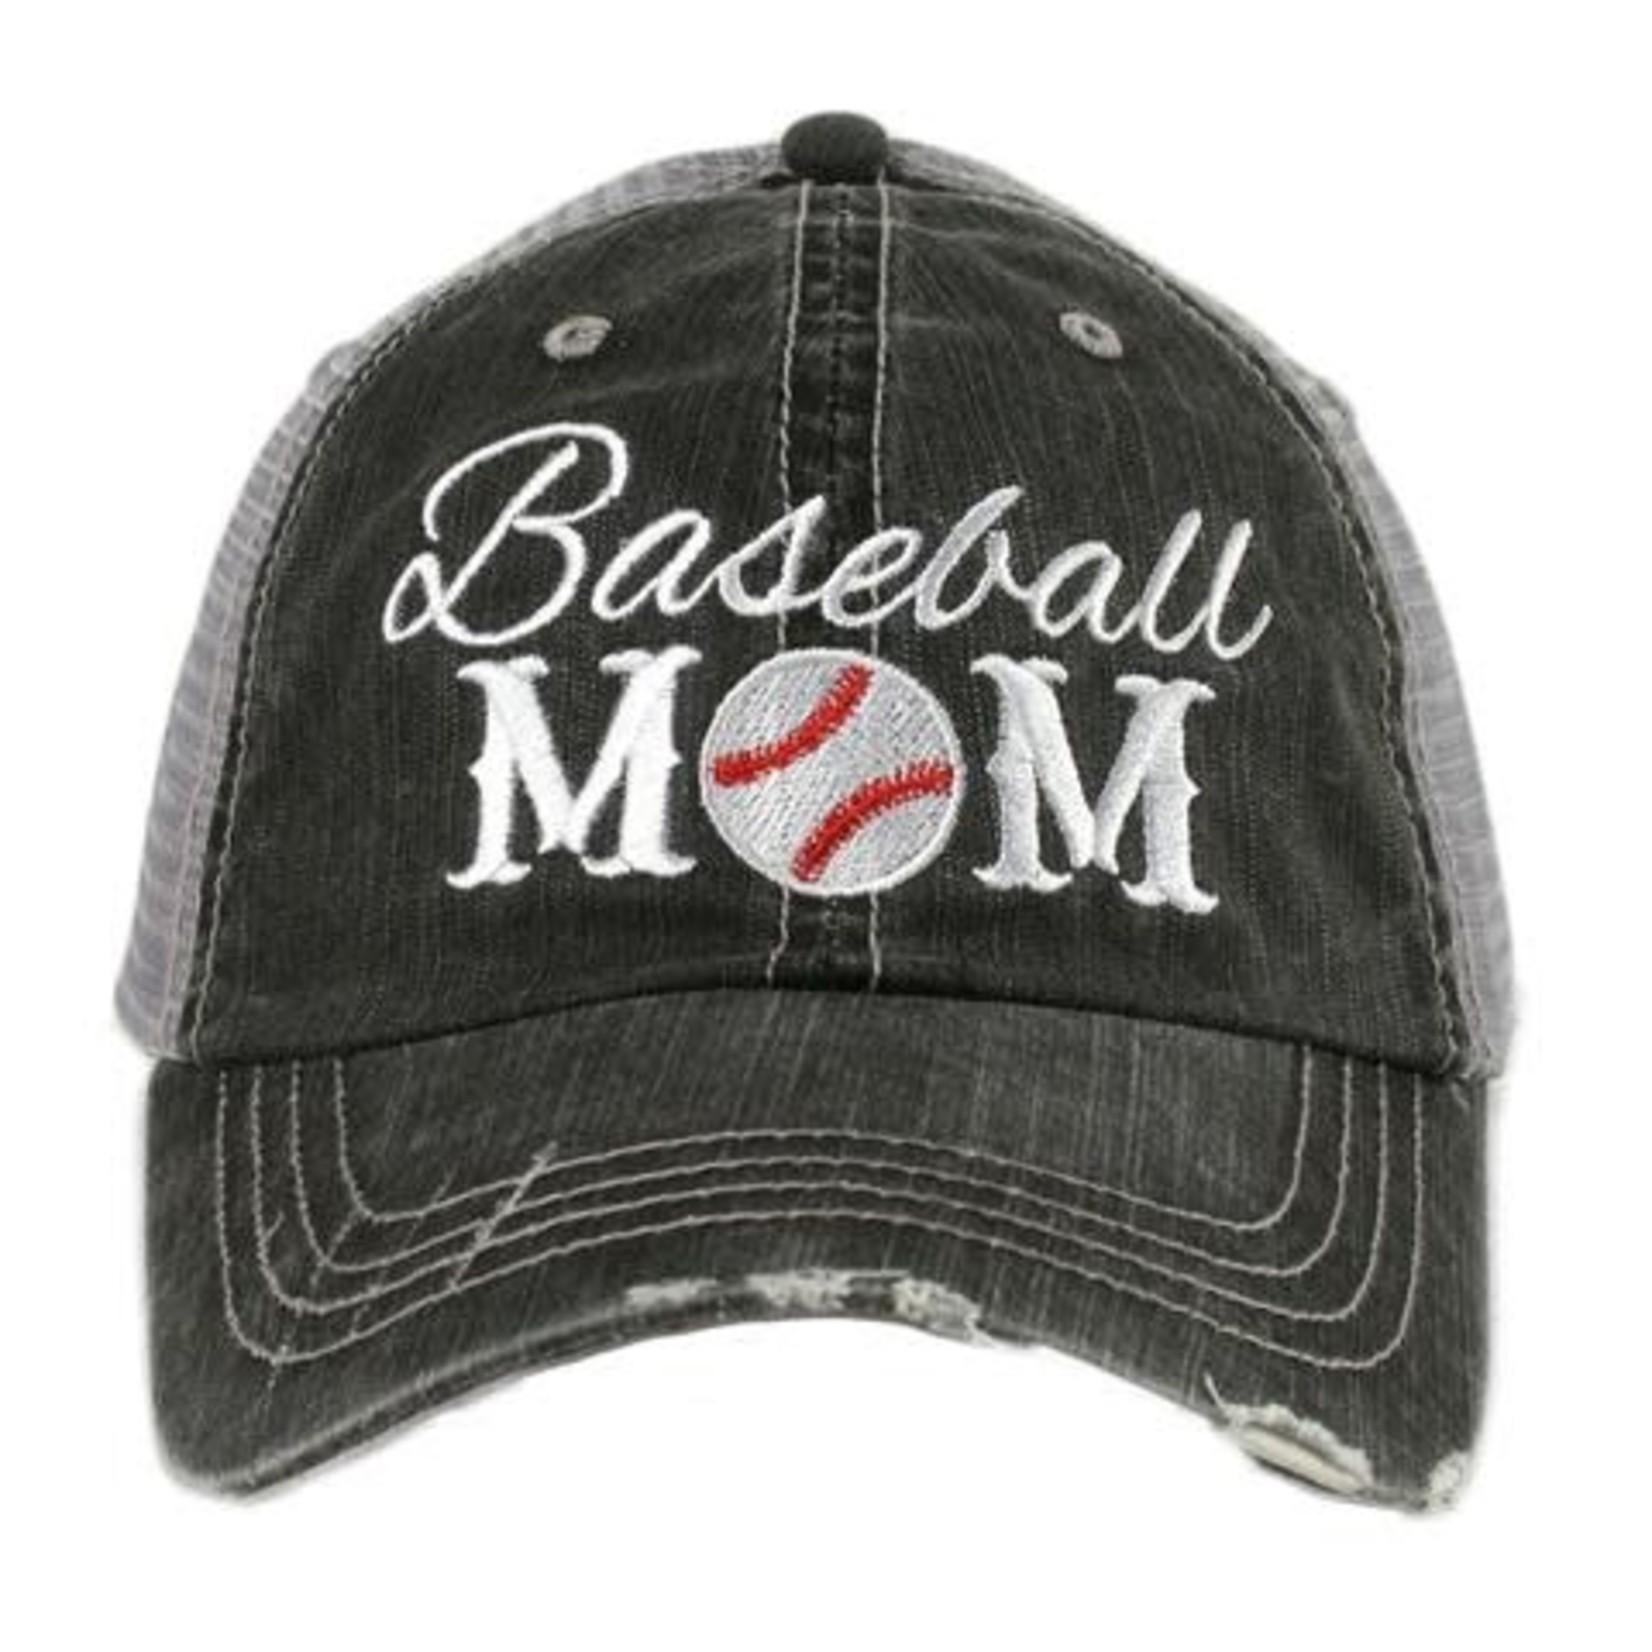 Baseball Mom Truckers Cap